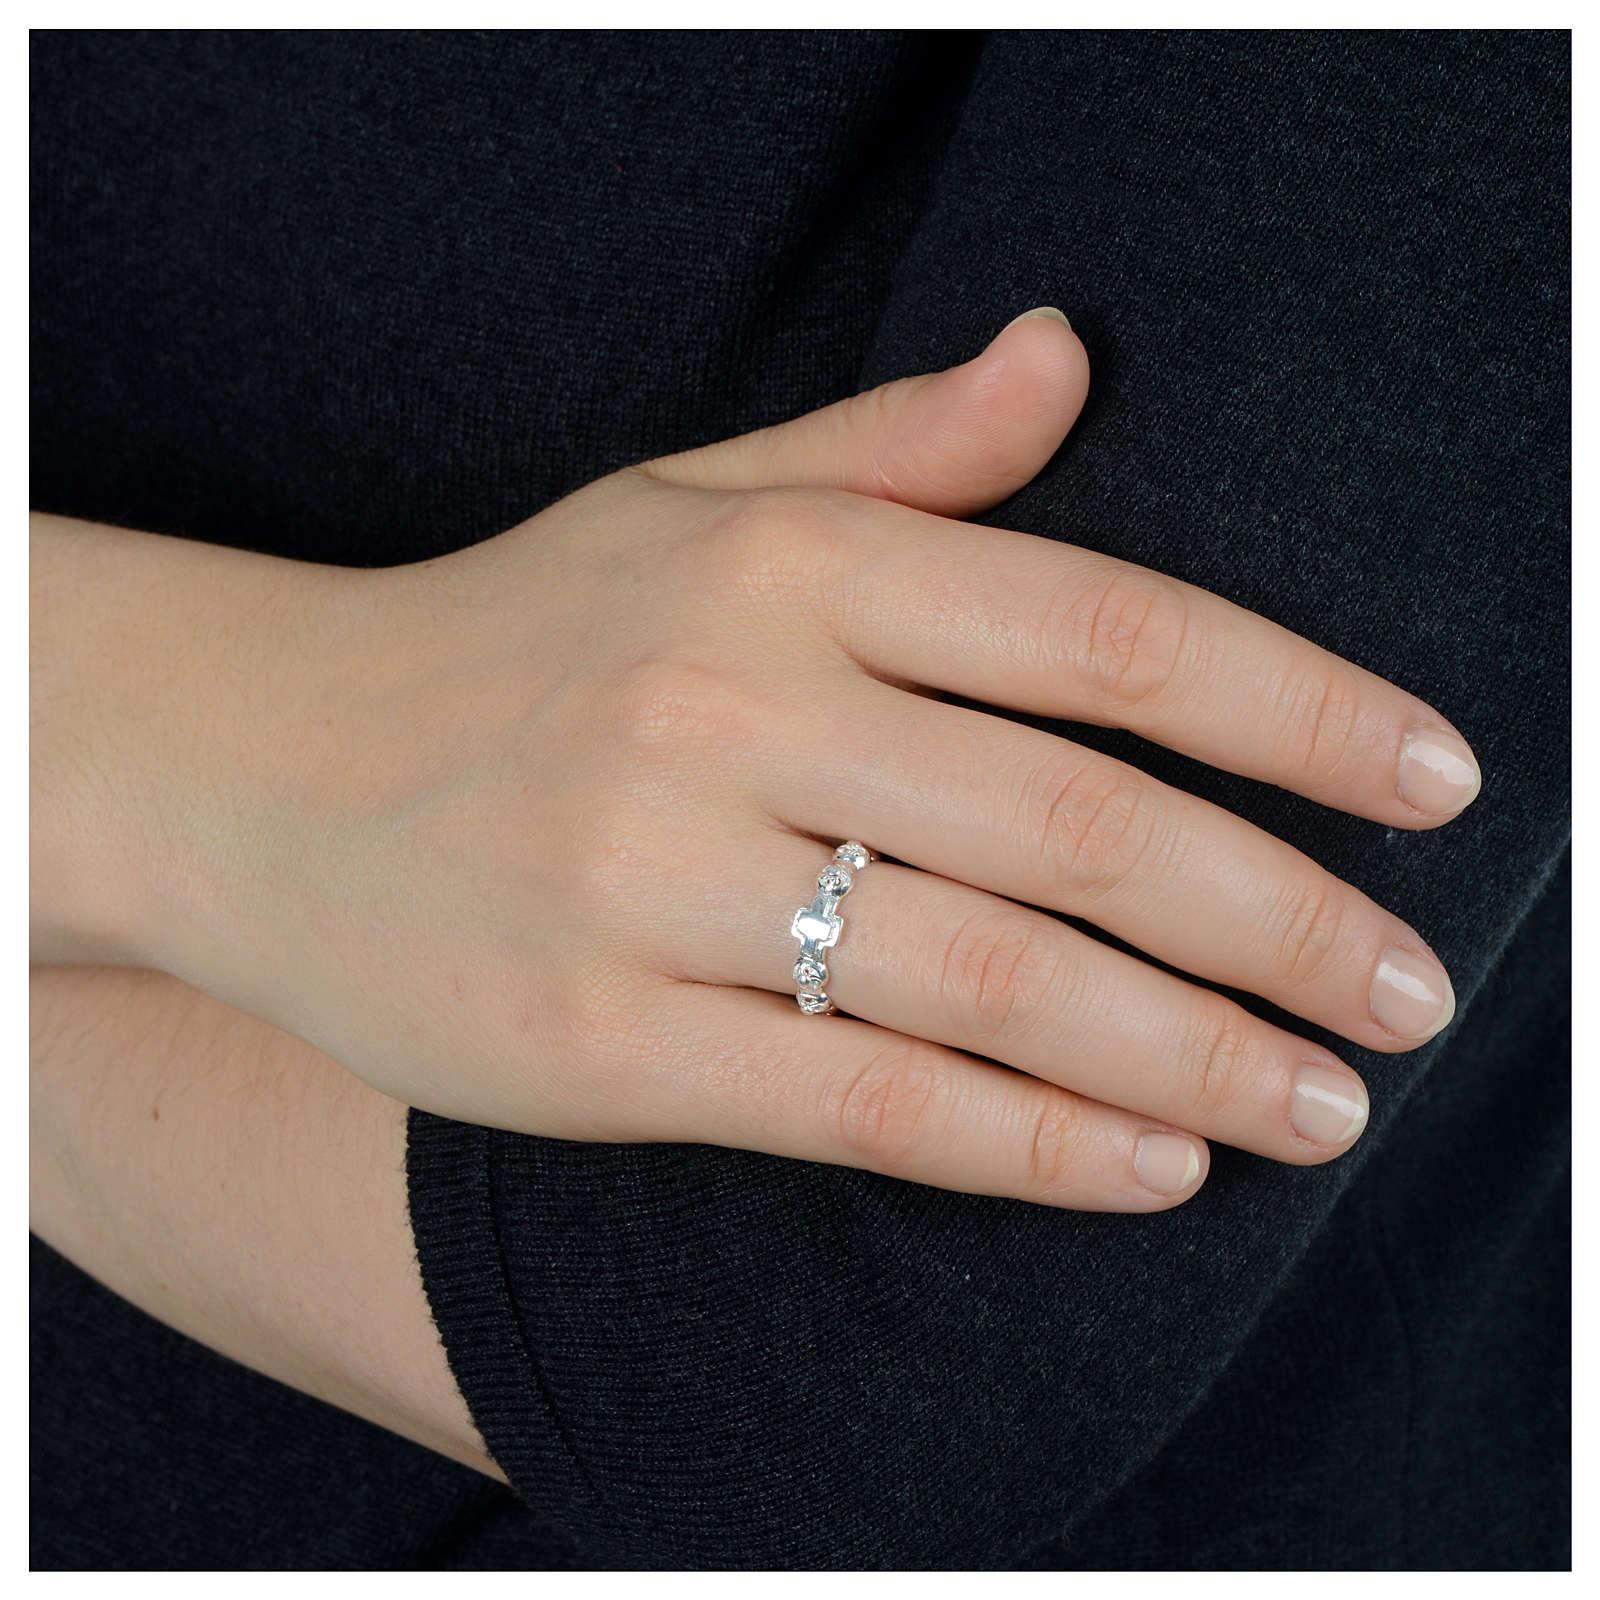 Dezena anel prata 925 decorada 3